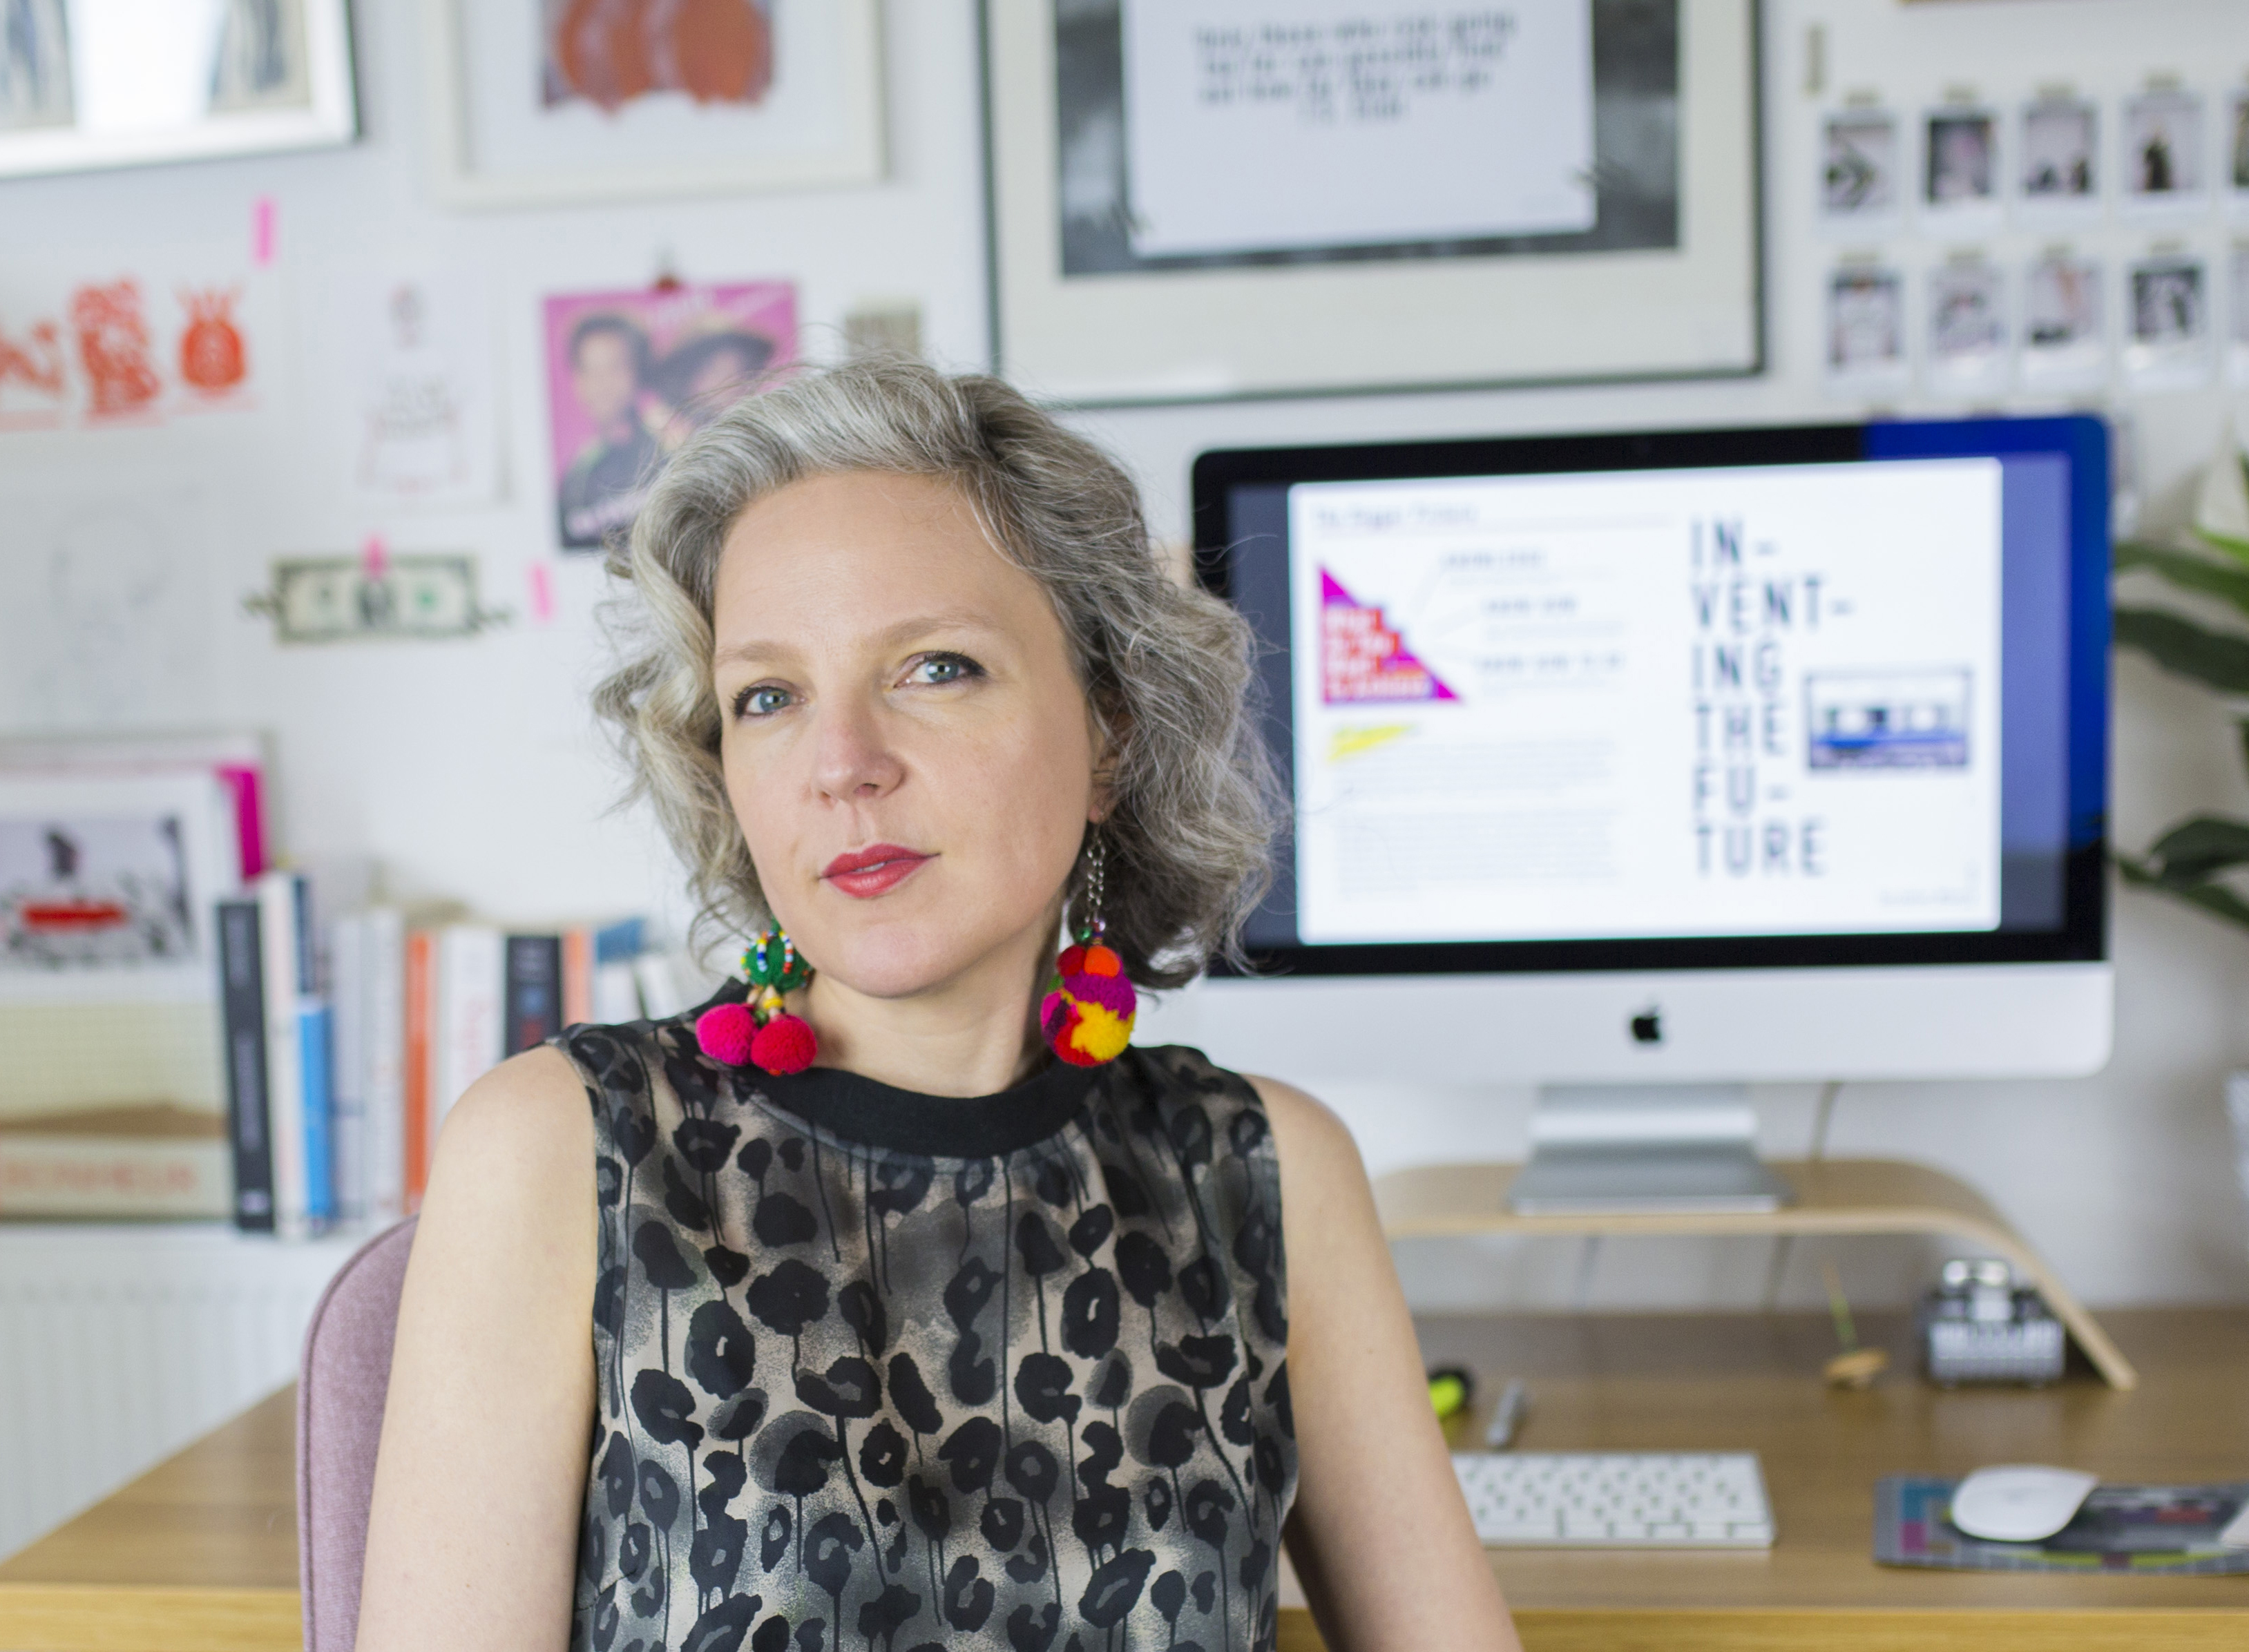 Geraldine Wharry